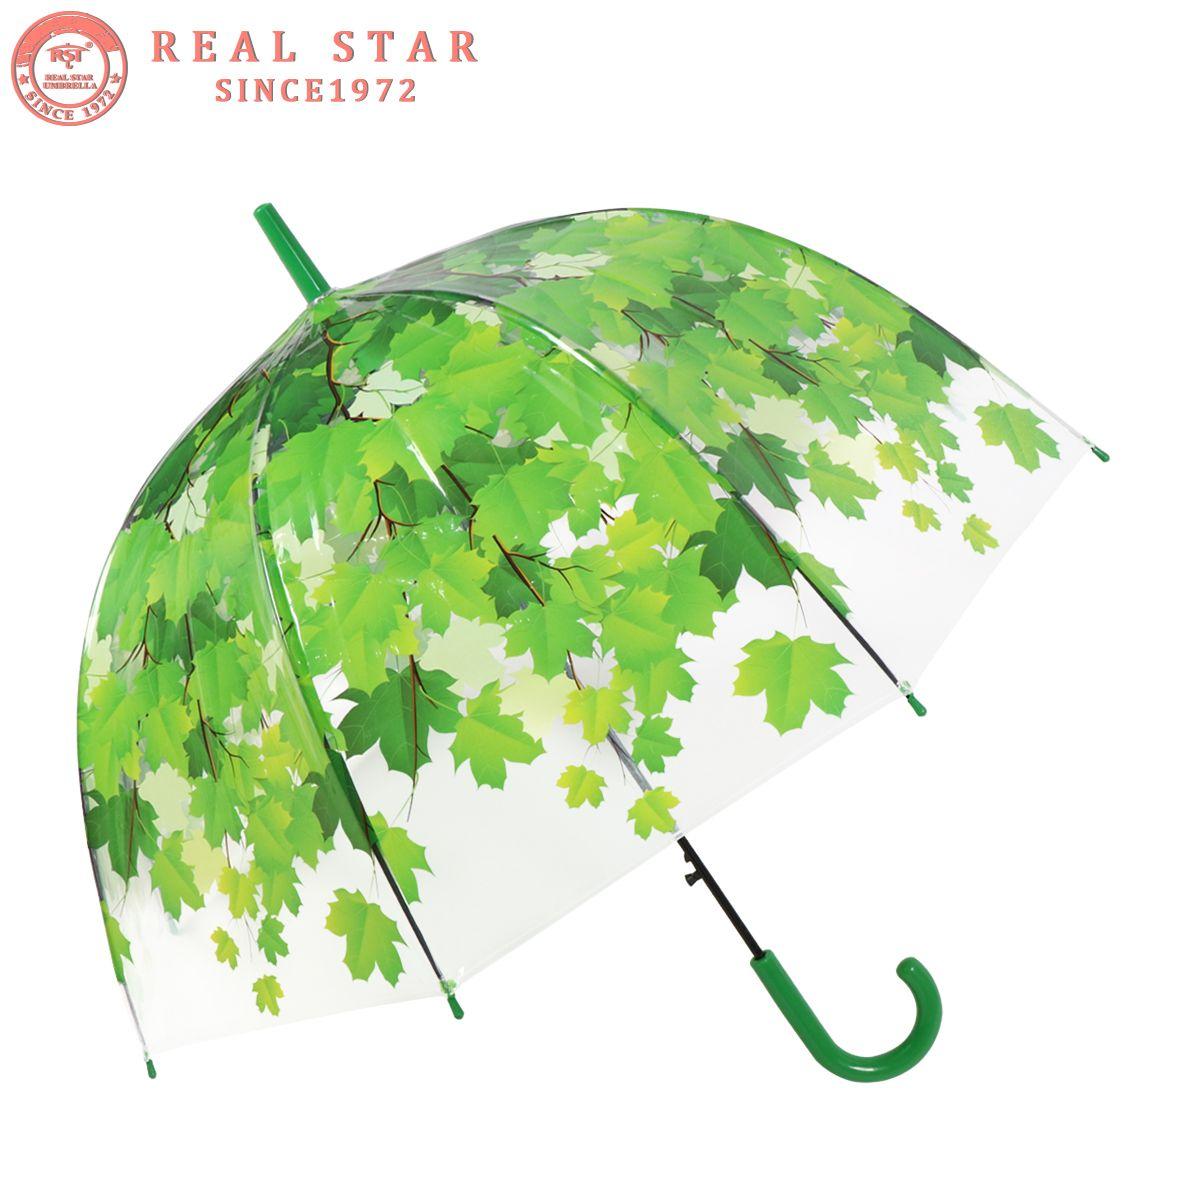 RST Real Star  brand new fashion dome clear umbrella green leaves transparent apollo disposable umbrella parapluie Elparaguas der schirm #clearumbrella